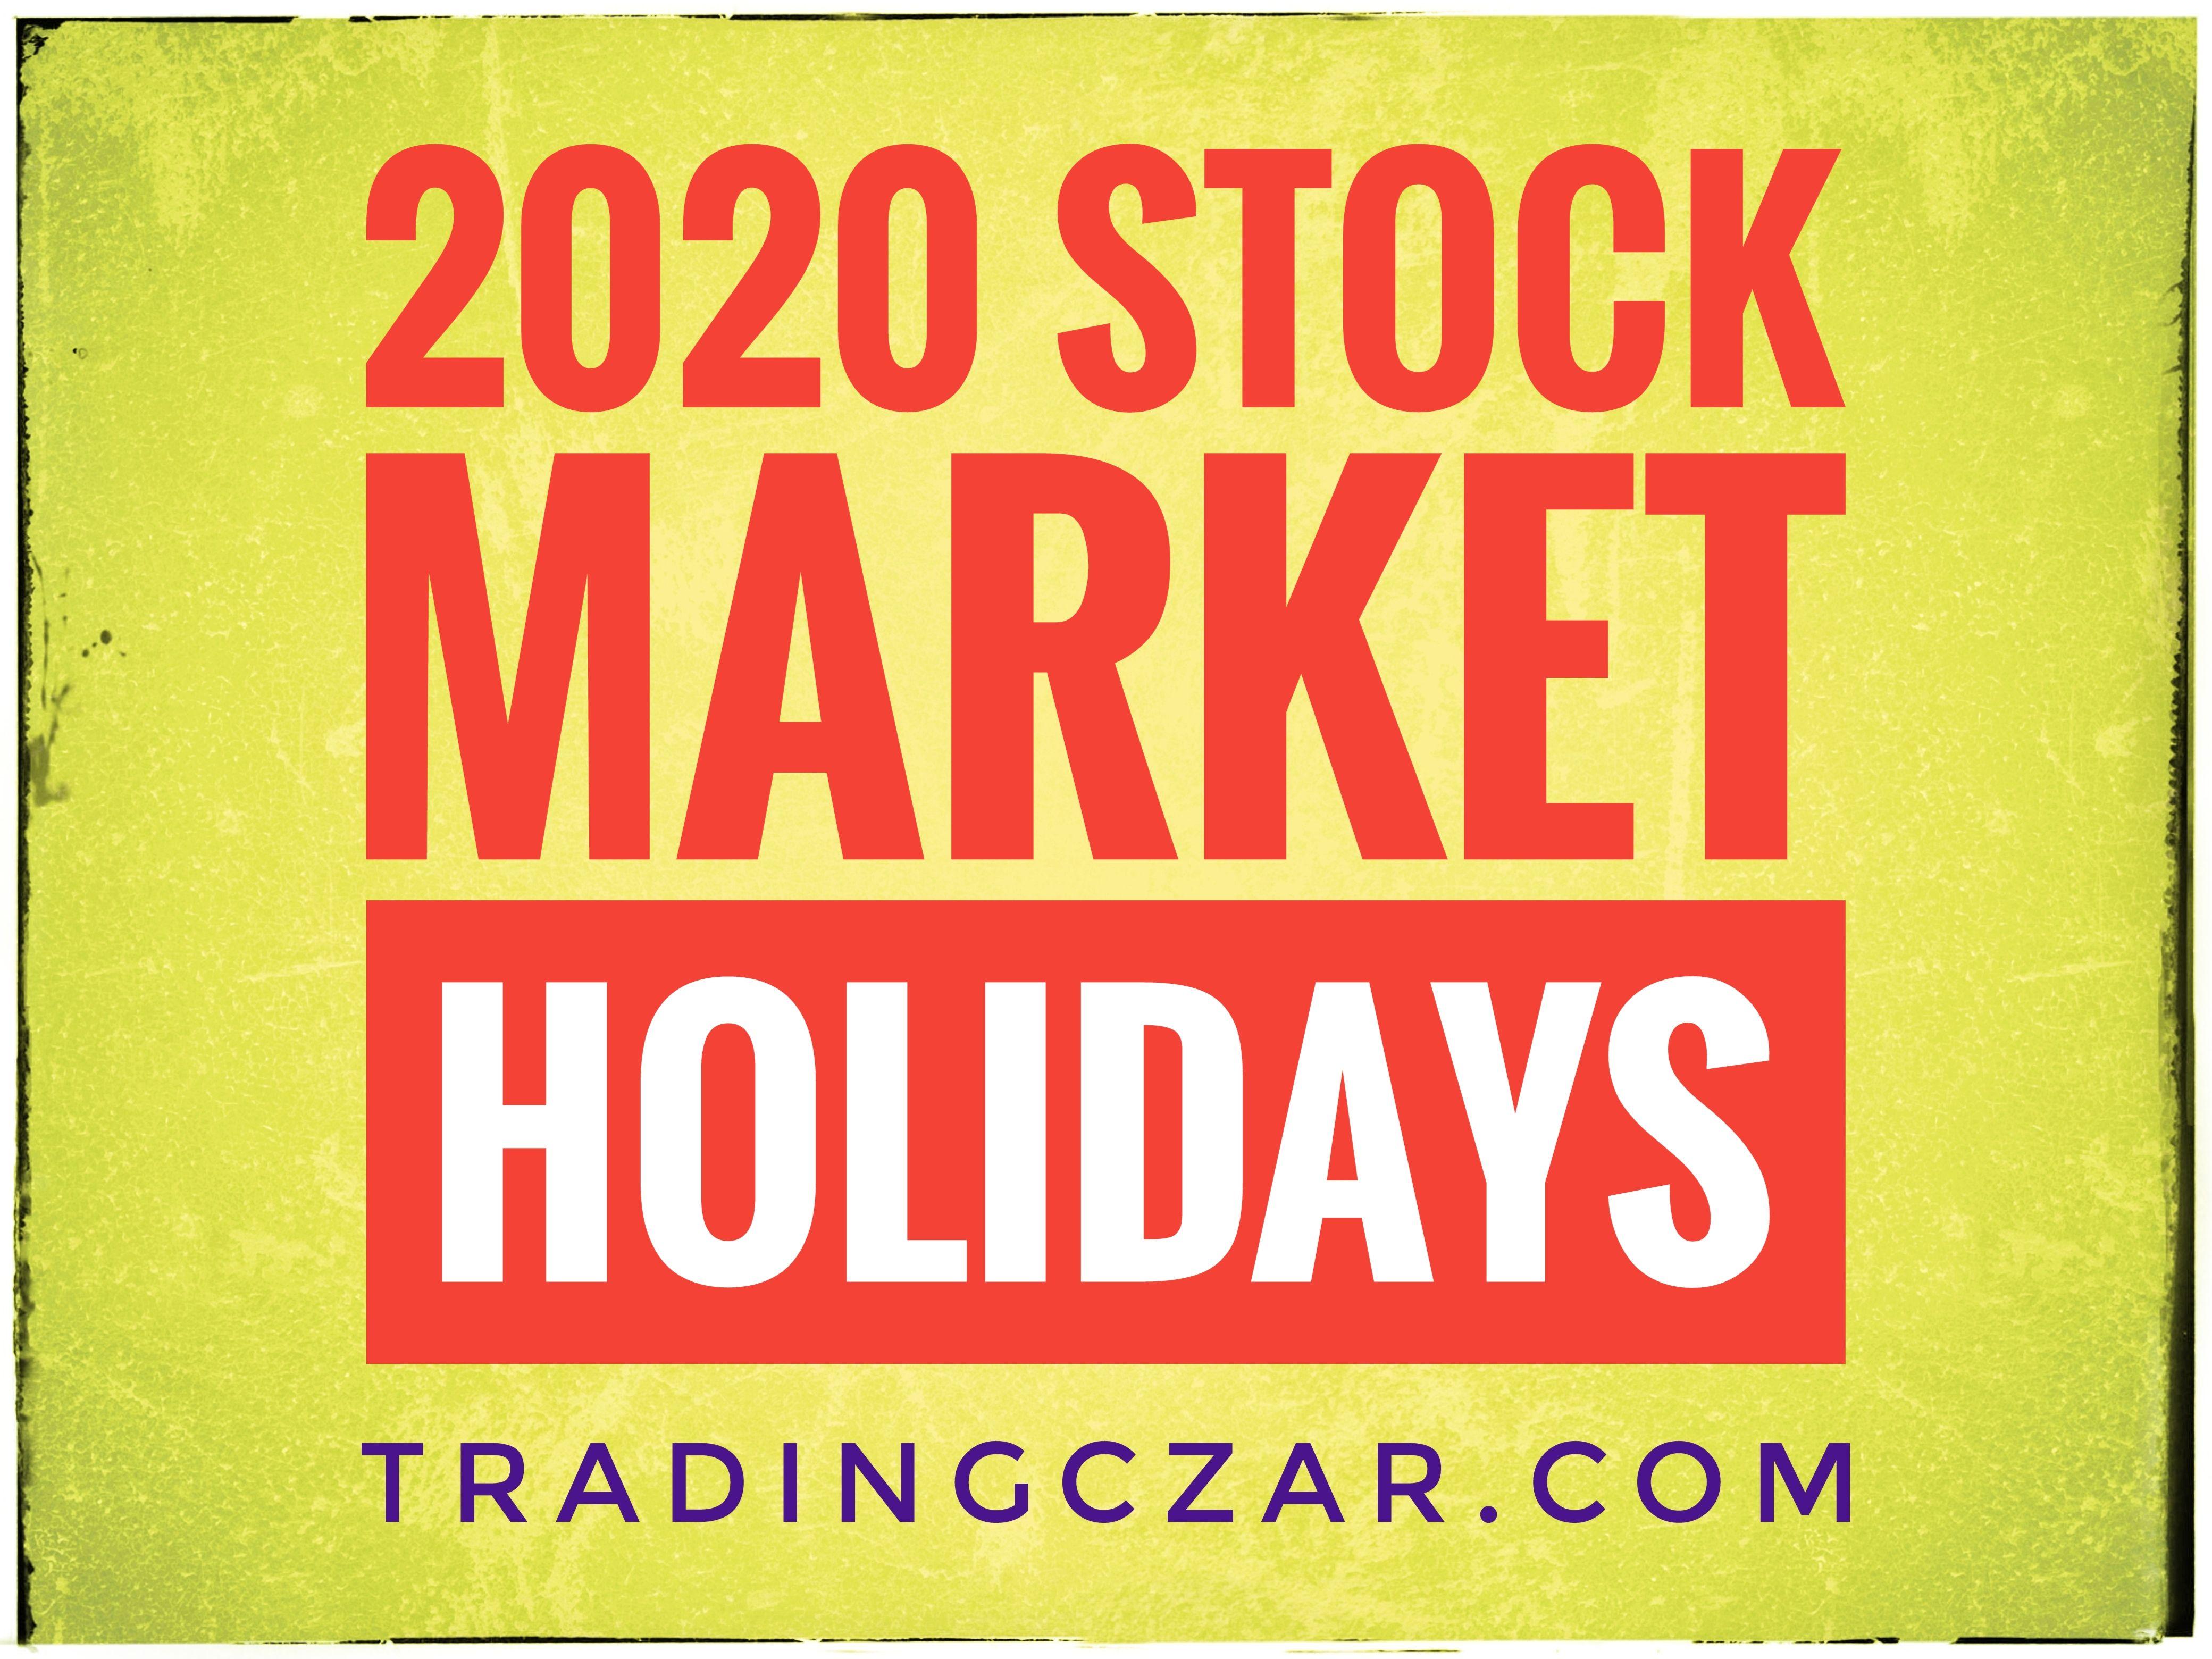 2020 Stock Market Holidays 2020 New York Stock Exchange Holidays